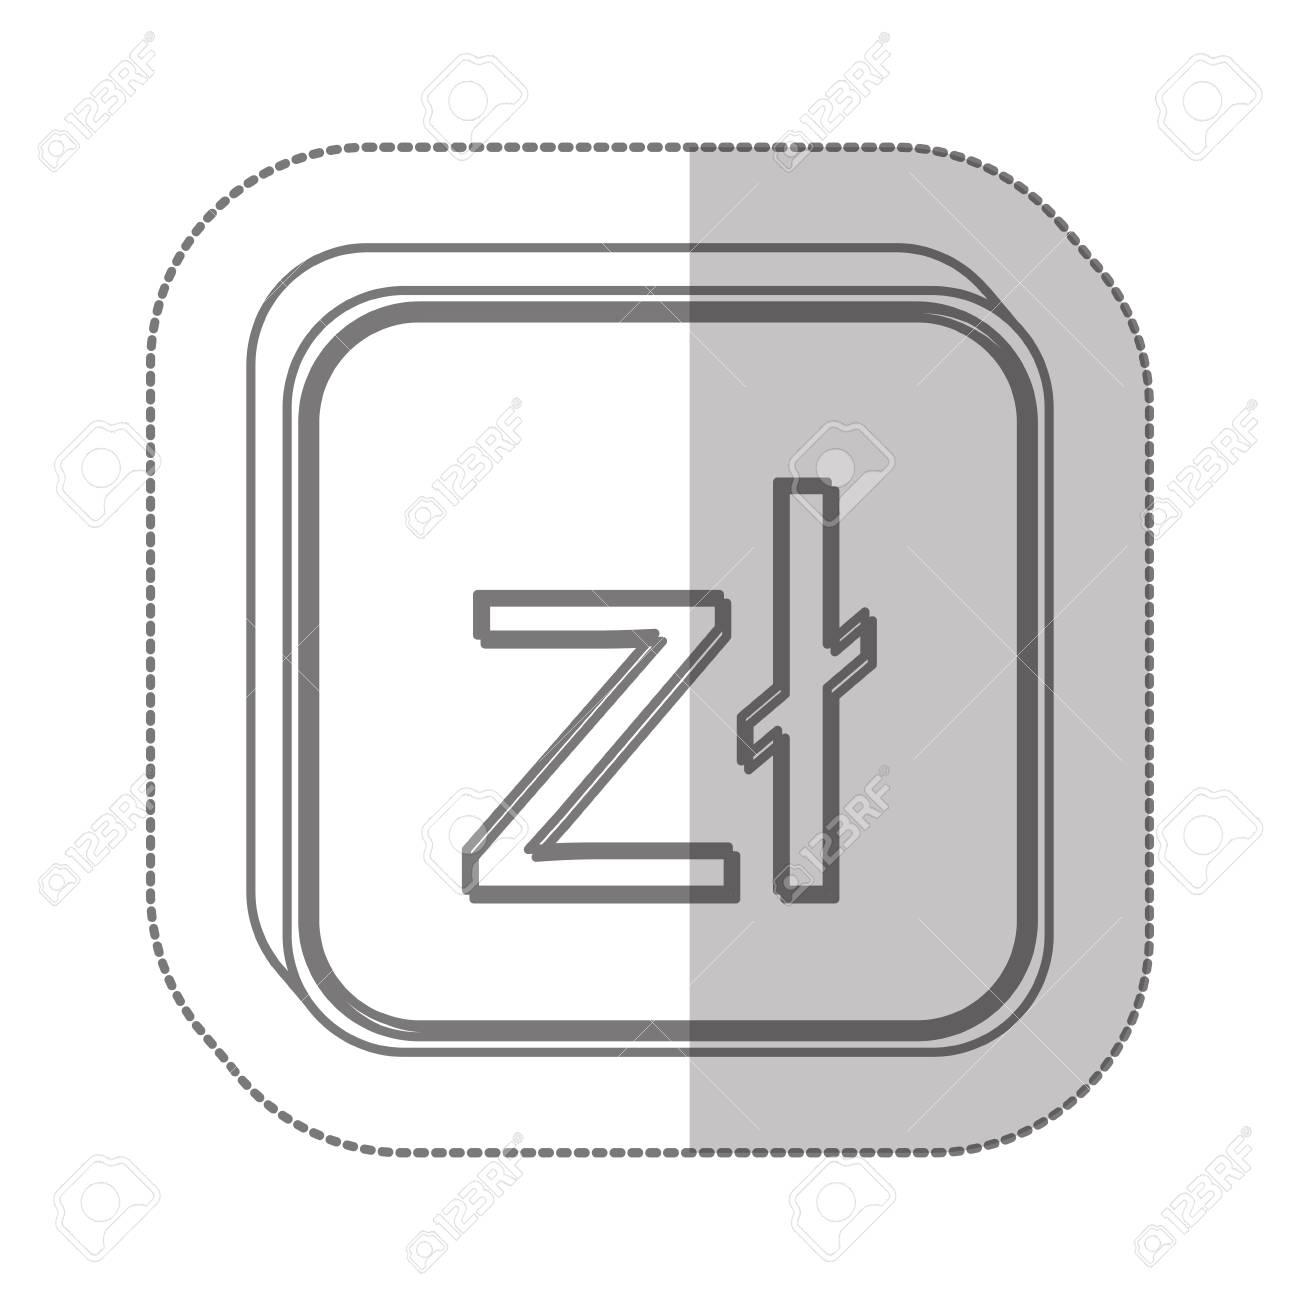 Polish Zloty Currency Symbol Icon Image Vector Illustration Royalty